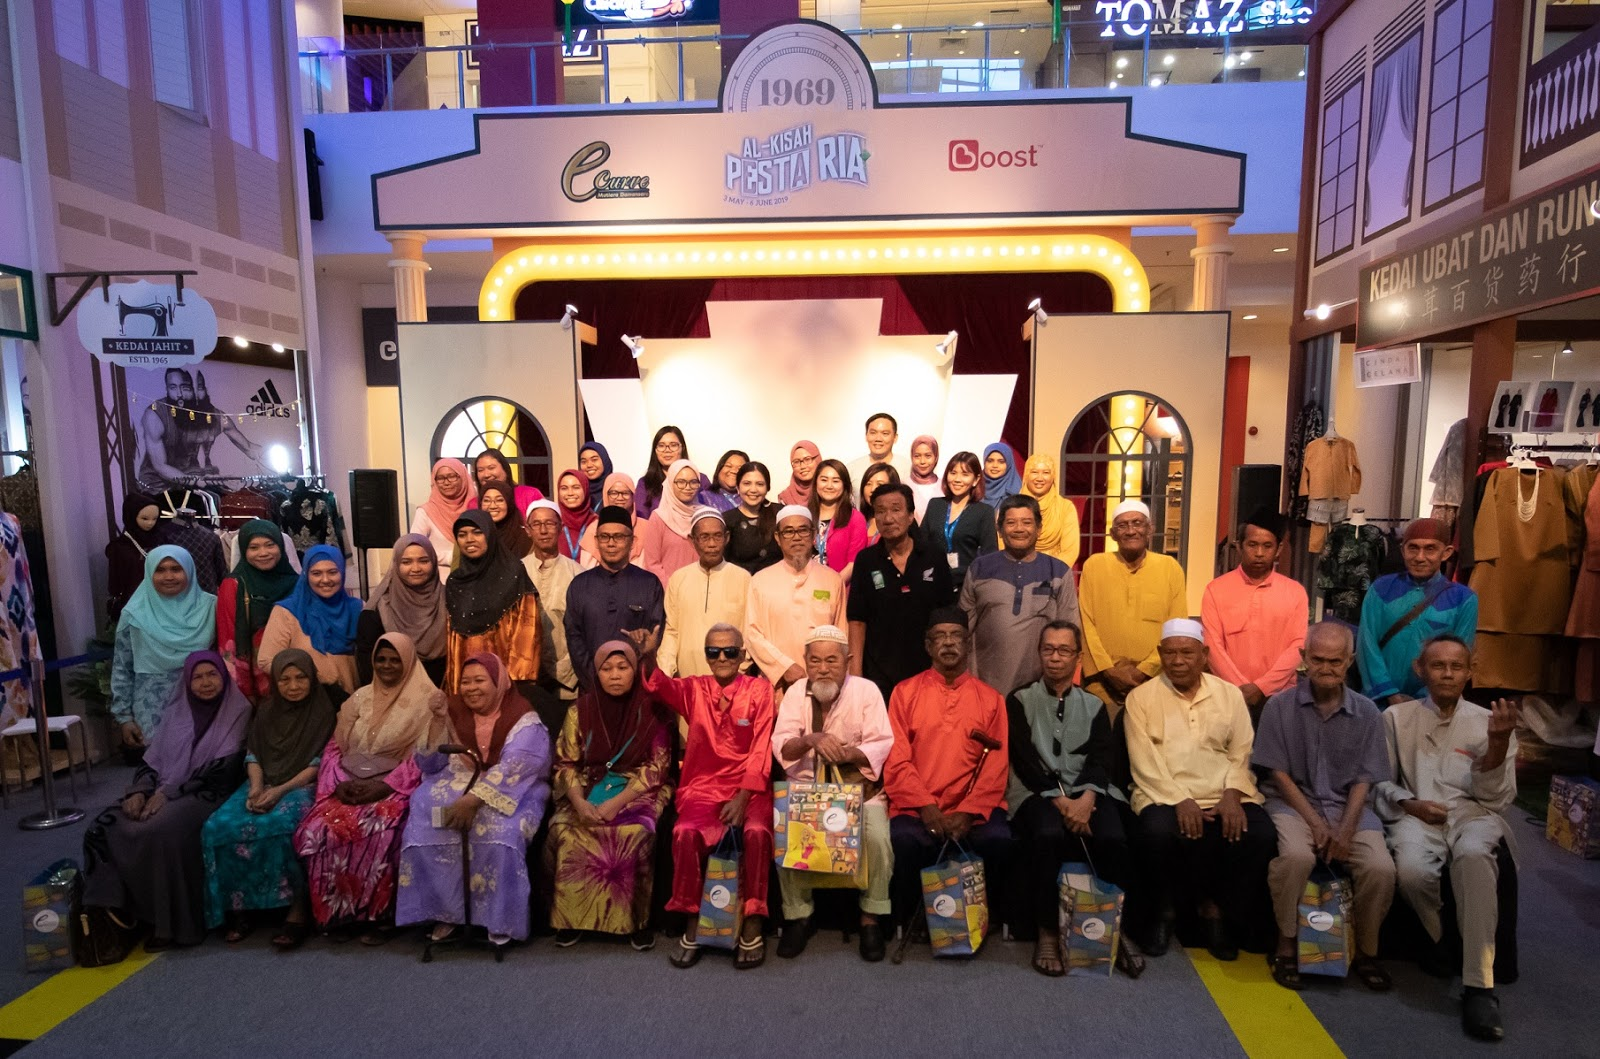 eCurve meraikan Ramadhan Penuh Nostalgia Buat Warga Emas Pusat Jagaan AlFikrah